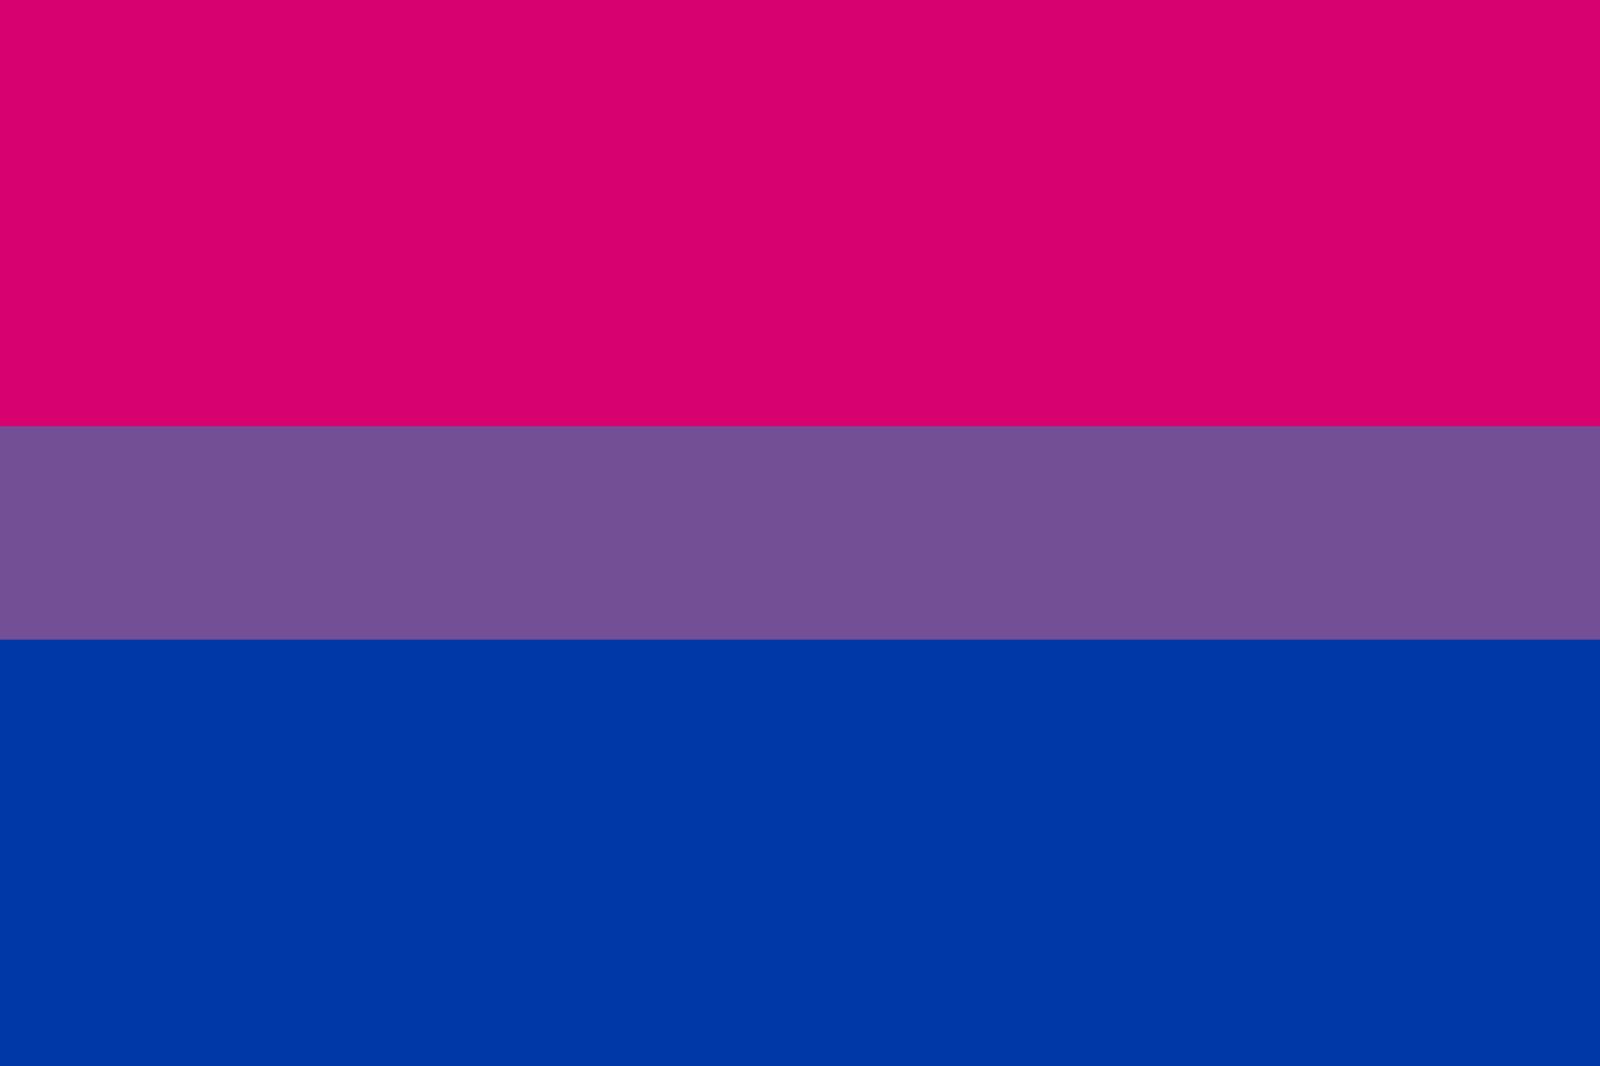 binet usa s biweek happy celebrate bisexuality day